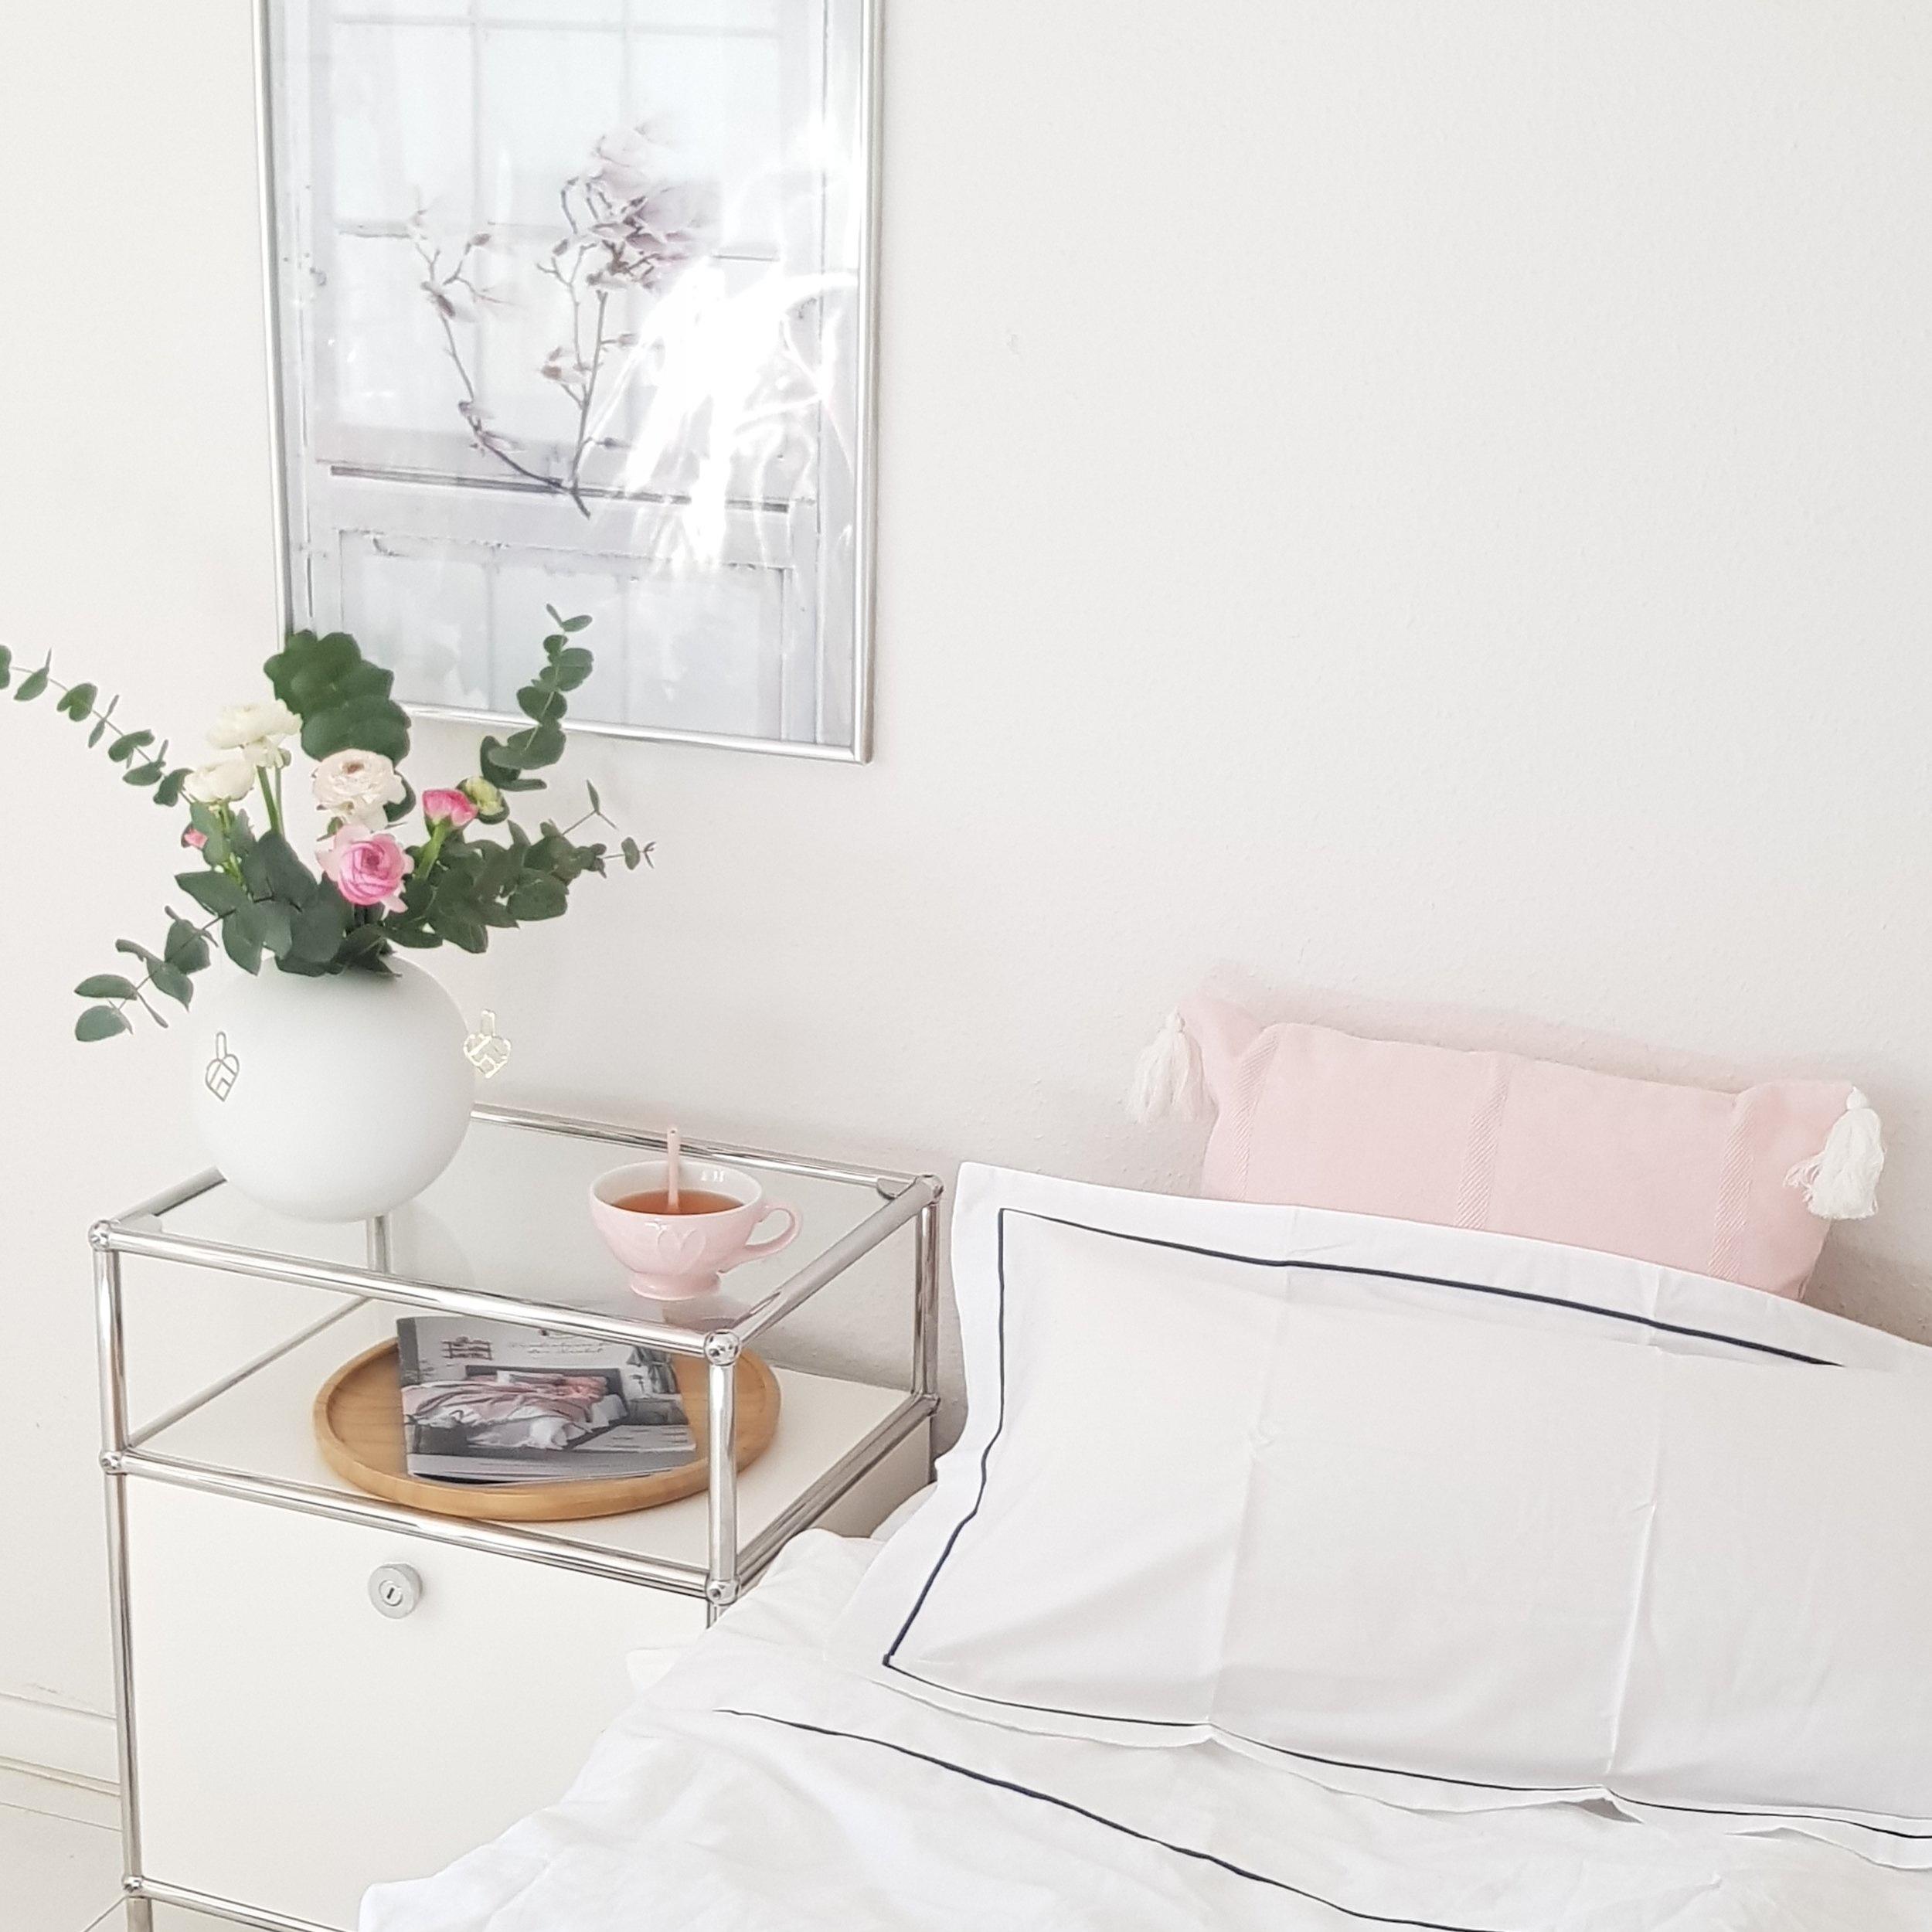 My+Luxury+Linen+Always+and+much%3B+sleep+routines+with+Sabine.jpg